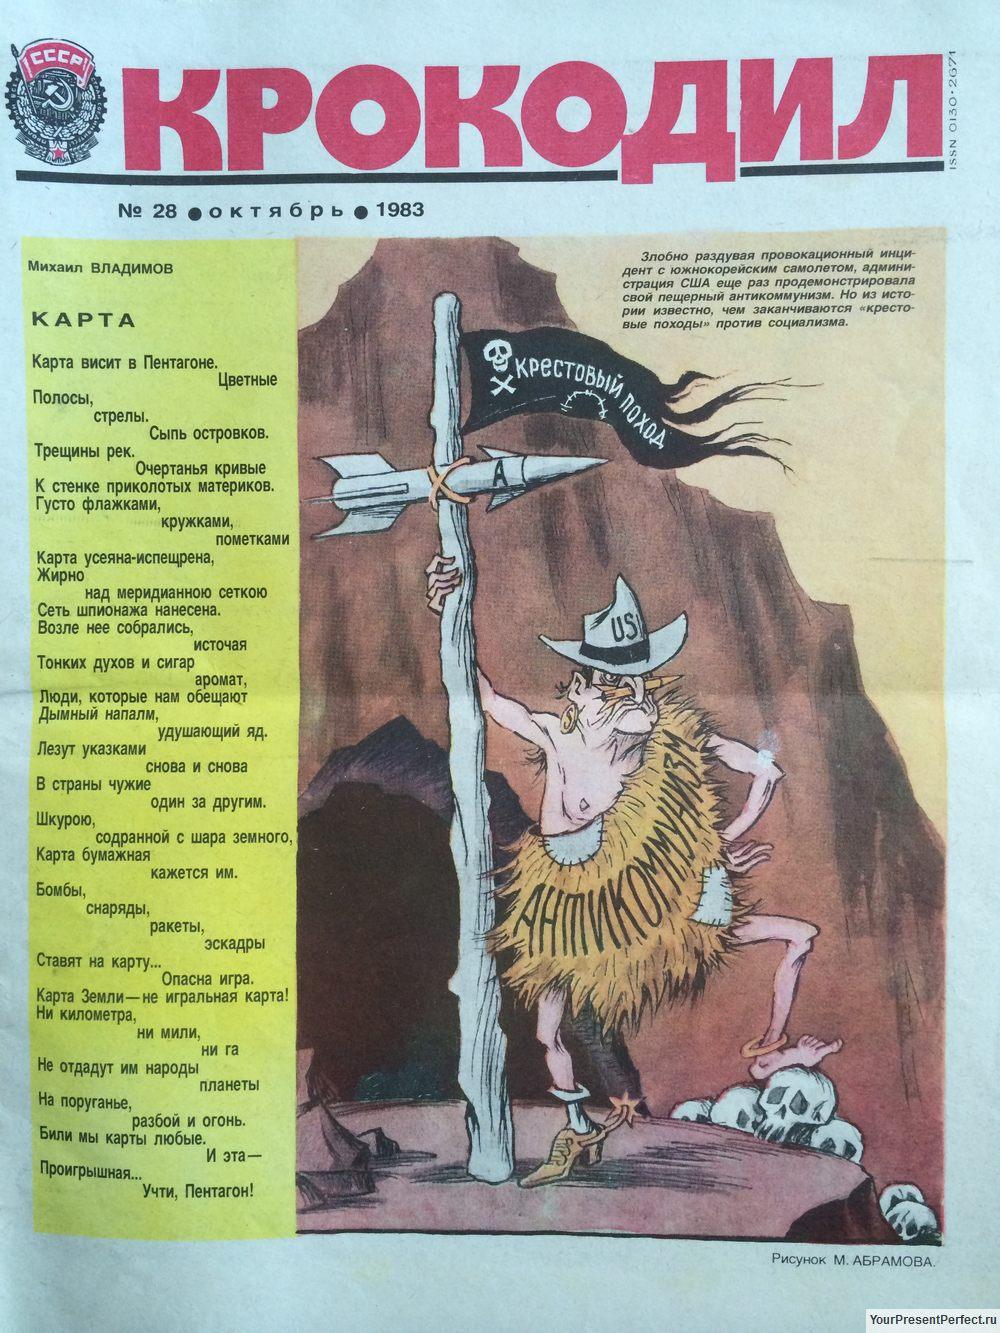 Журнал Крокодил №28 октябрь 1983